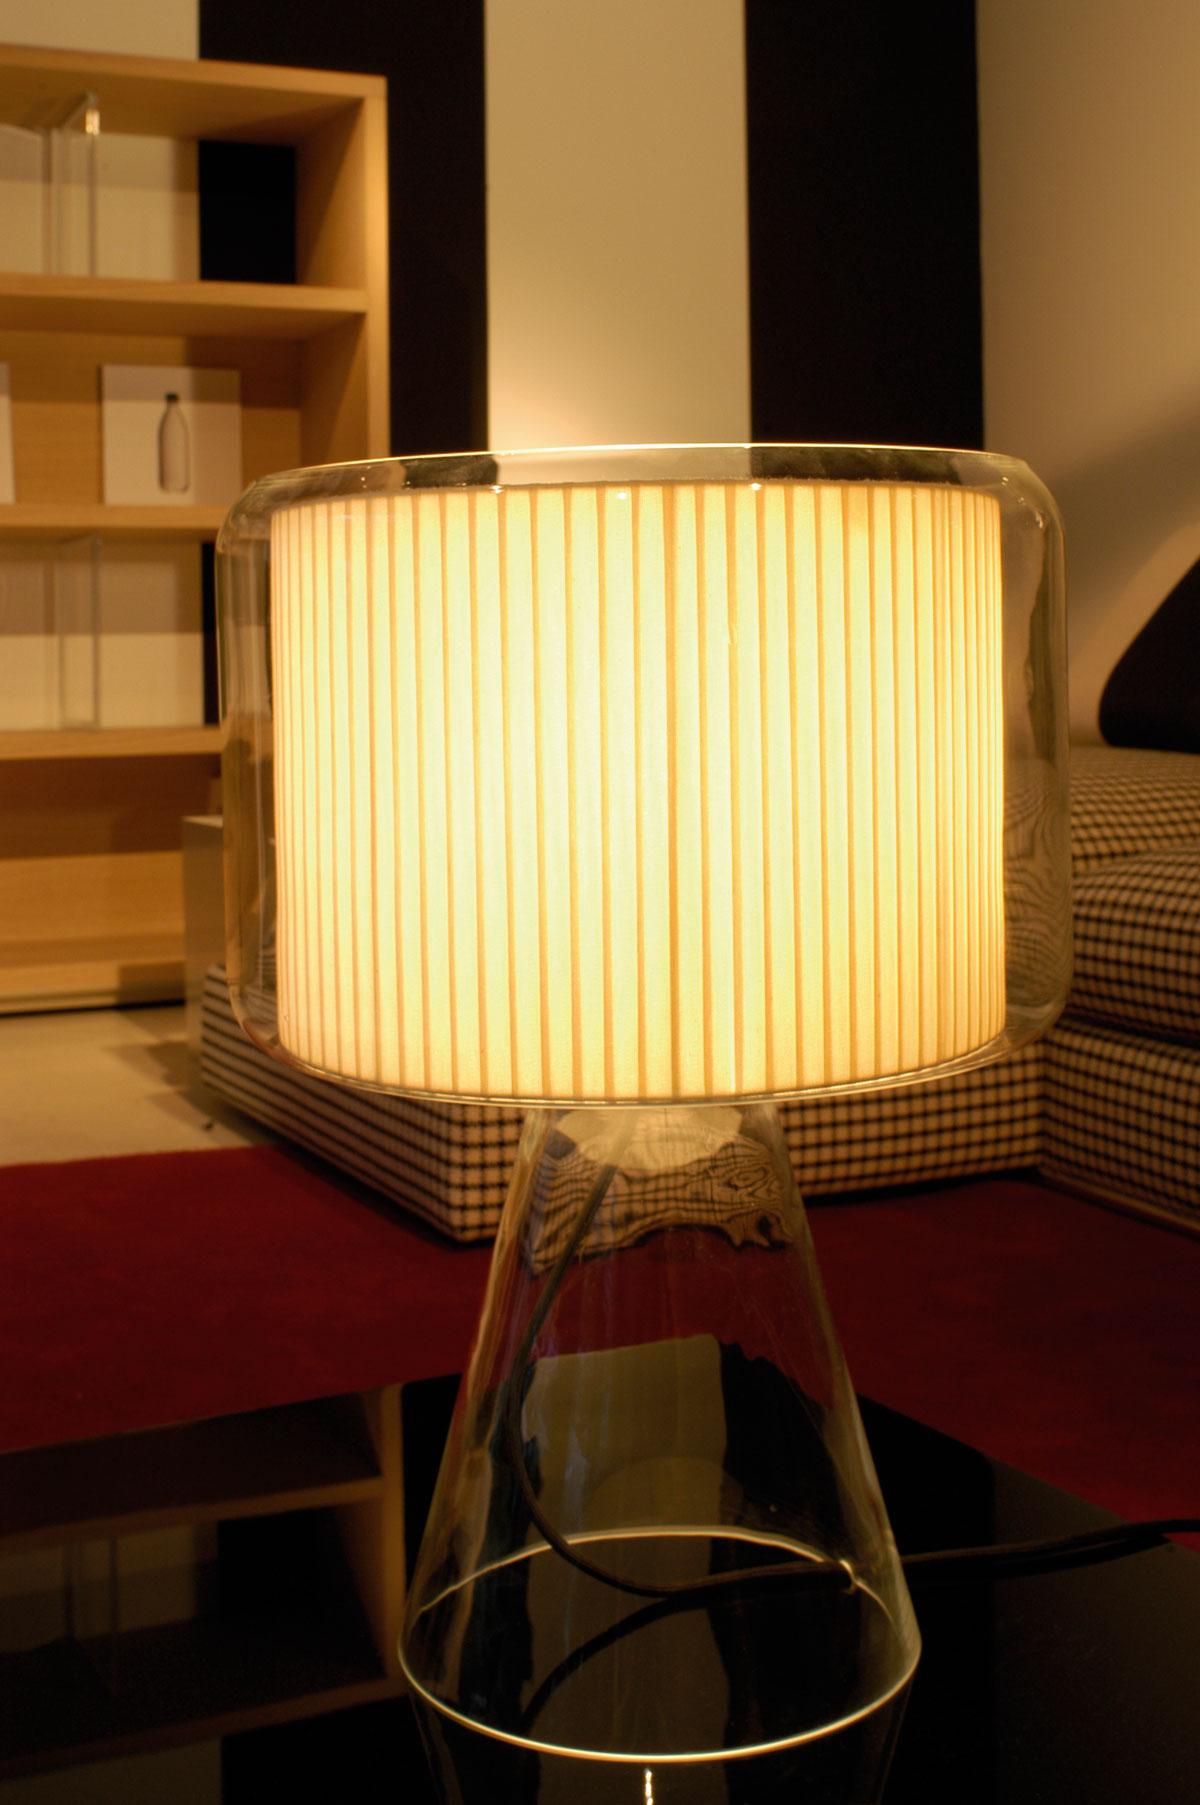 Mercer lampe ruban beige MM. Marset.